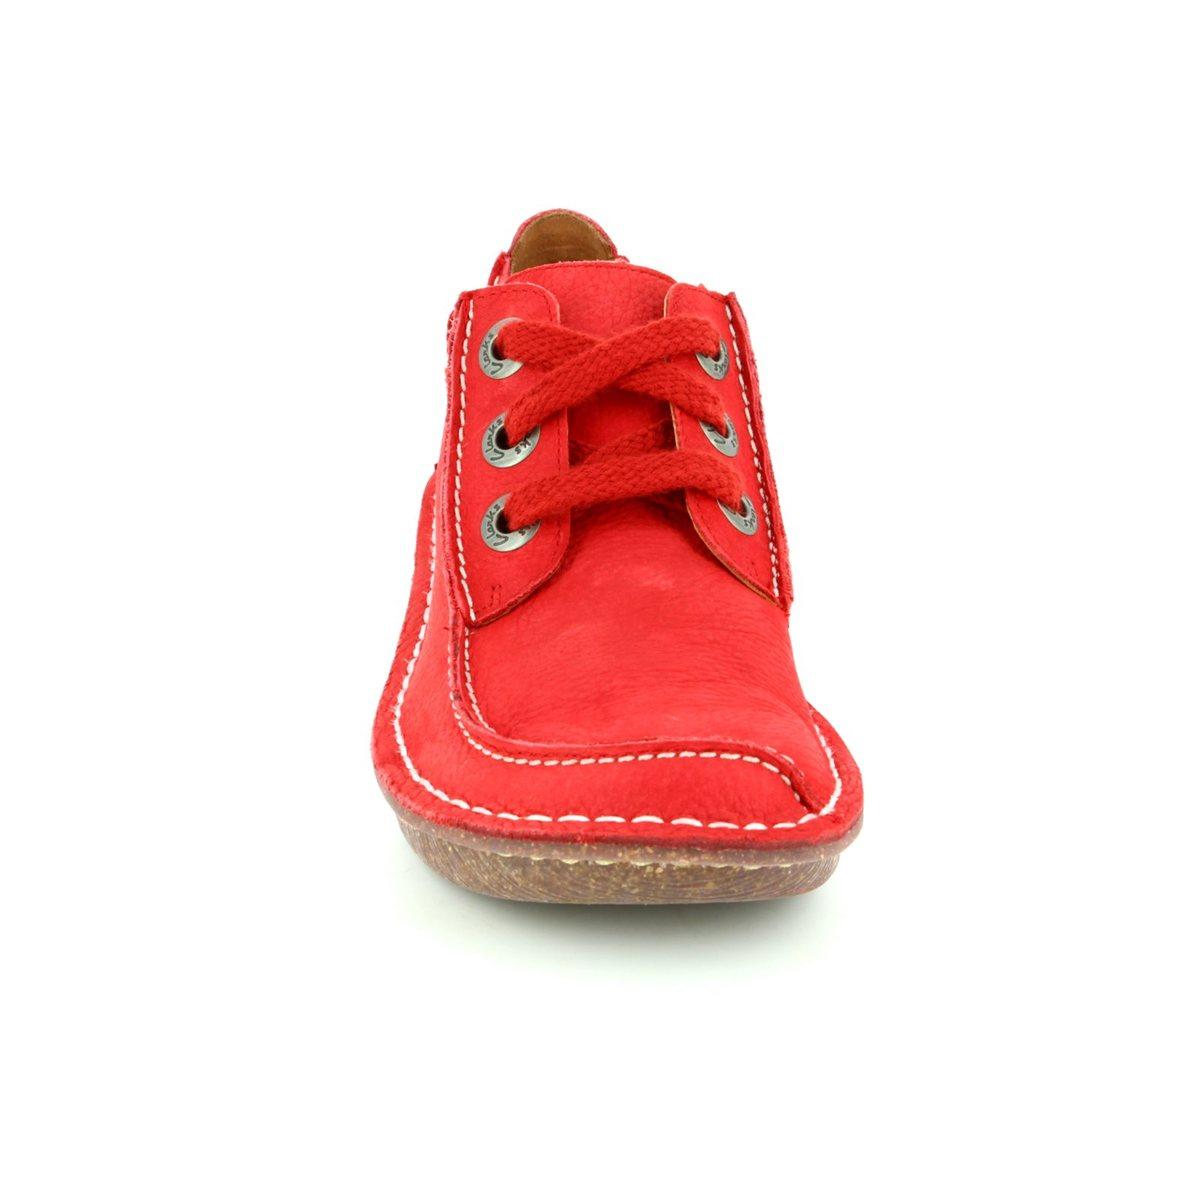 7cabdeda2bdb Clarks Lacing Shoes - Red - 1398 54D FUNNY DREAM